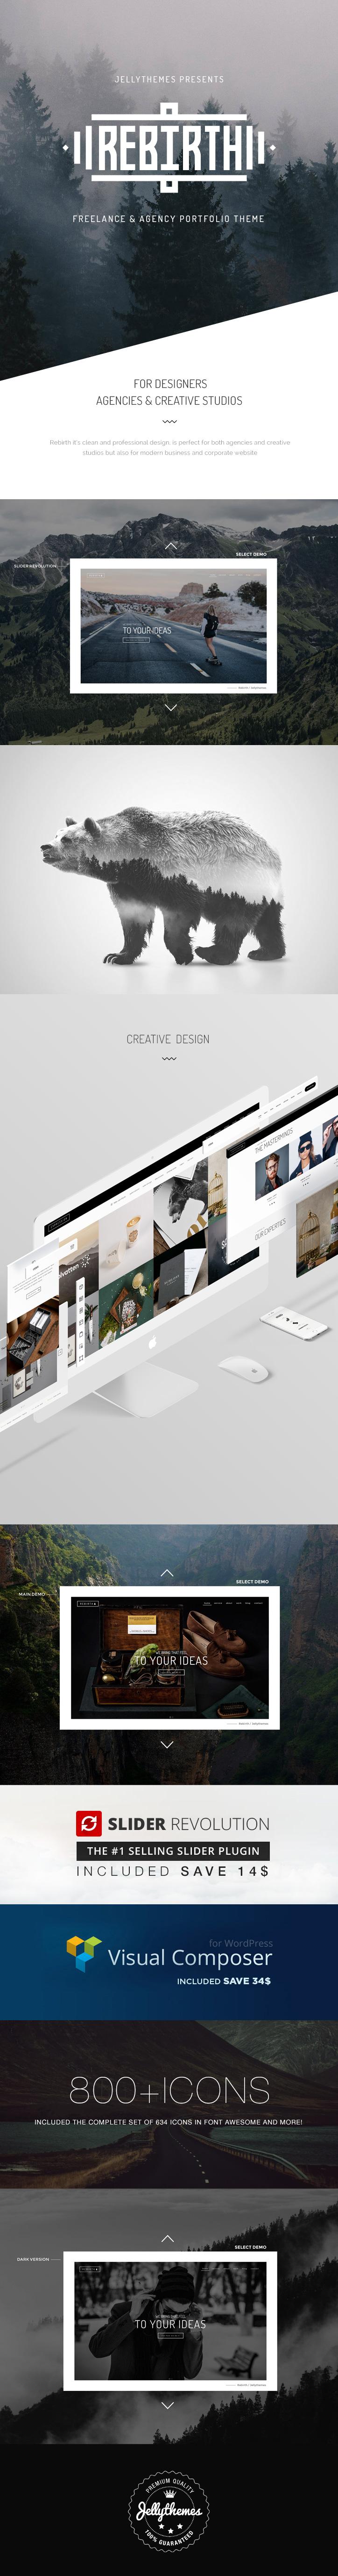 Rebirth - Freelance & Agency Portfolio WordPress Theme (Creative) Rebirth - Freelance & Agency Portfolio WordPress Theme (Creative) rebirthprevwp